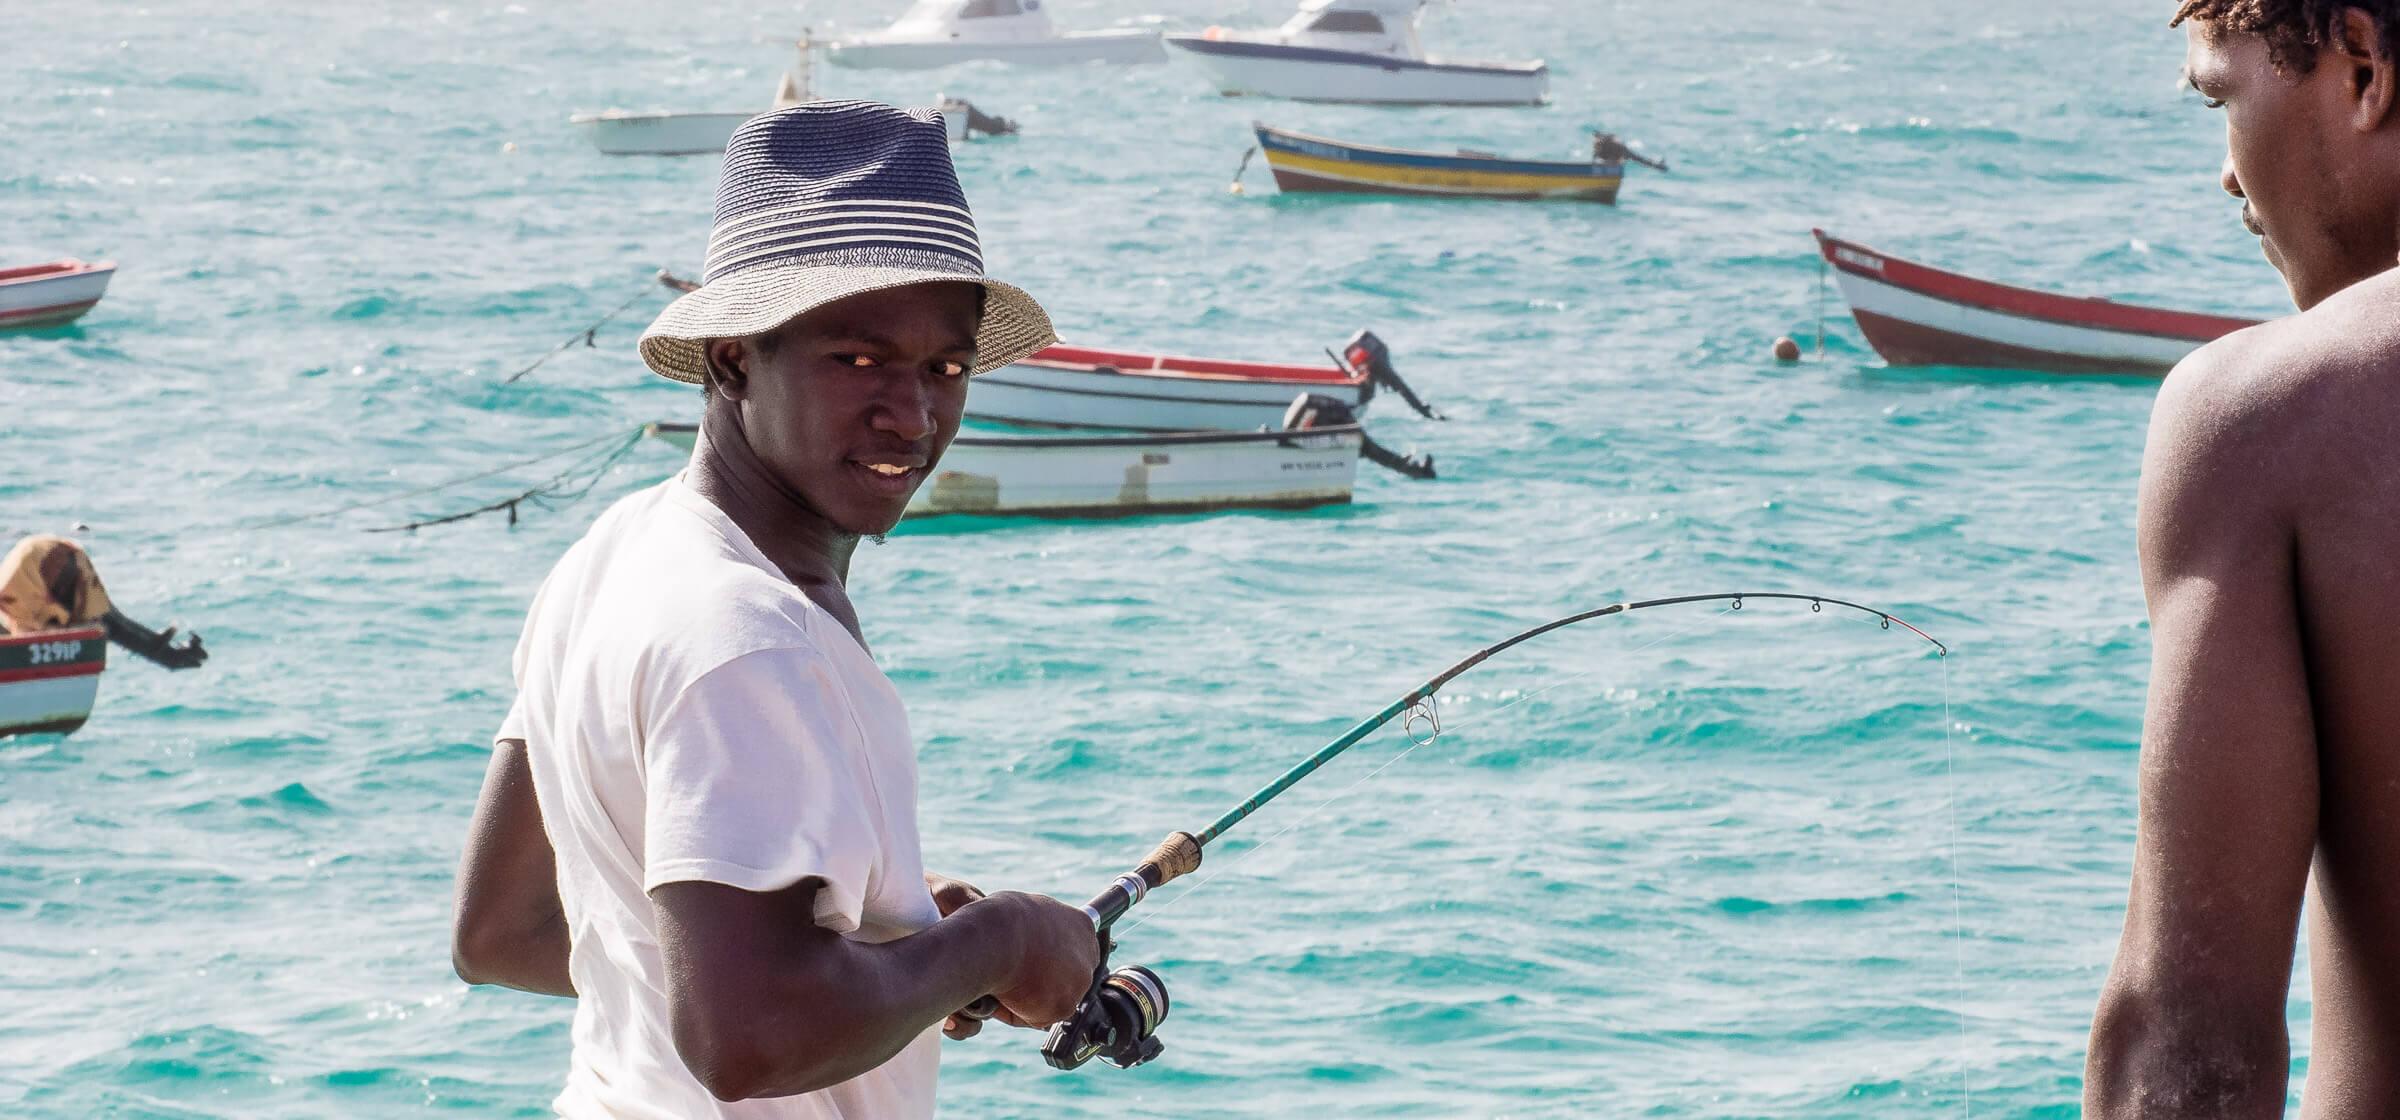 Fisherman on the Sal Island, Cape Verde